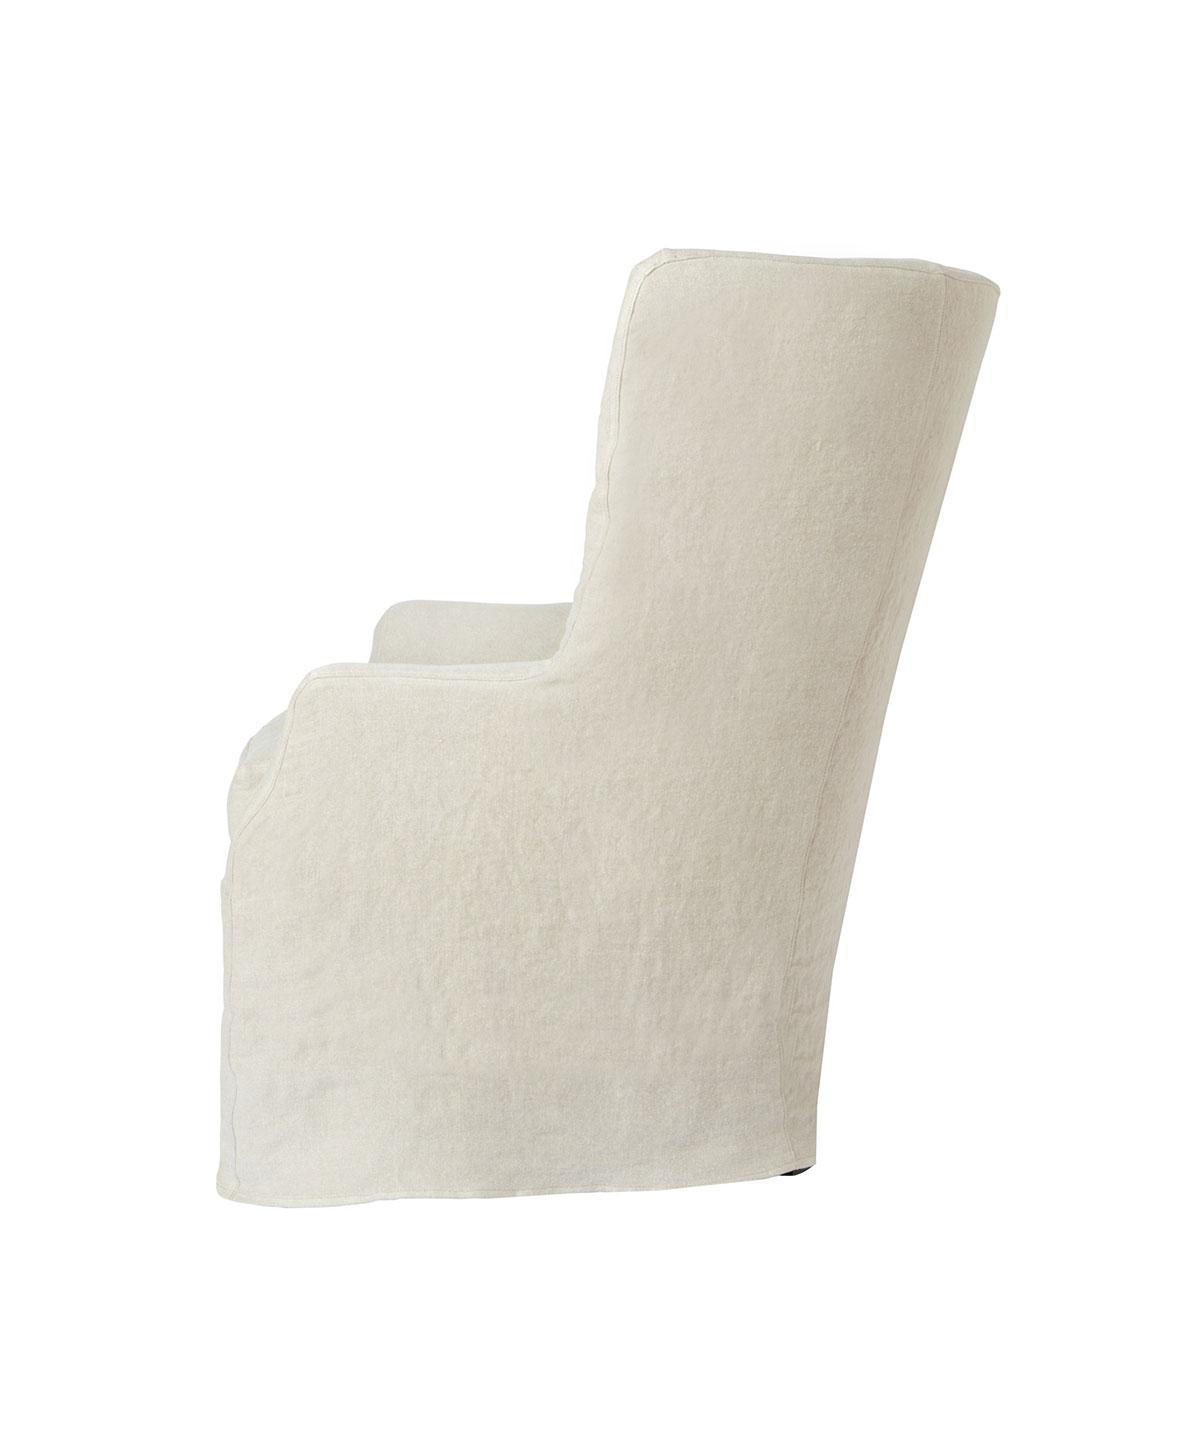 Federico Slipcovered Chair